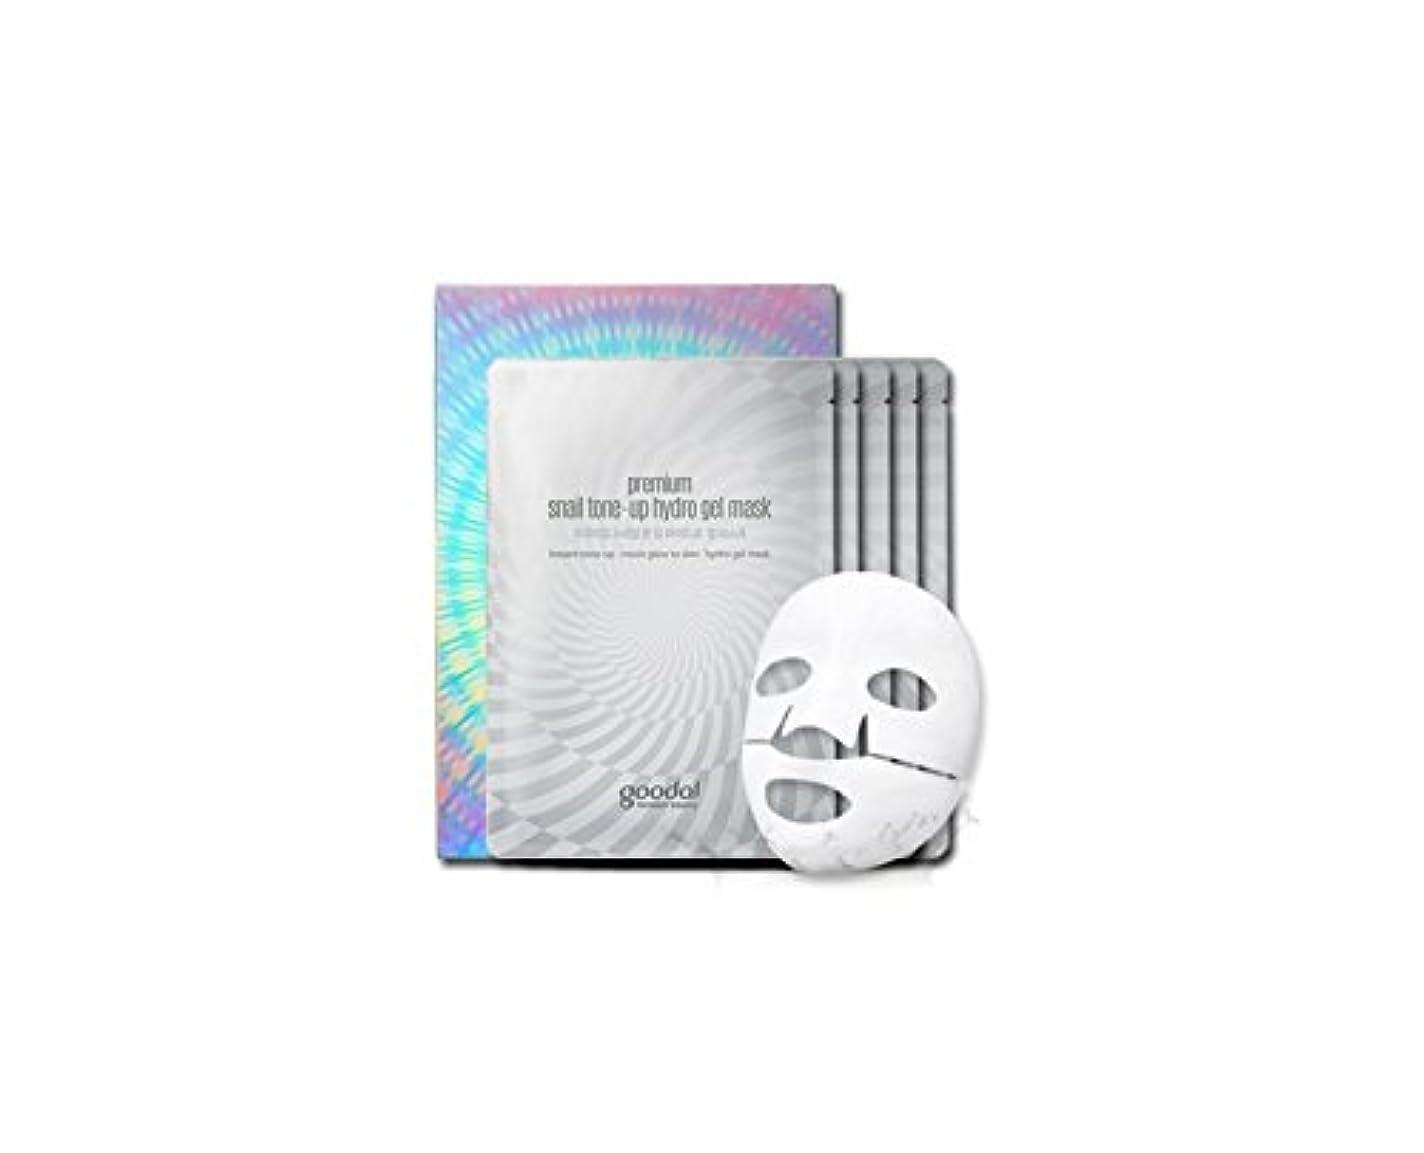 goodal Premium Snail Tone Up Hydro Gel Mask (35g×5pcs)/グーダル プレミアム スネイル トーンアップ ハイドロ ゲル マスク (35g×5pcs)